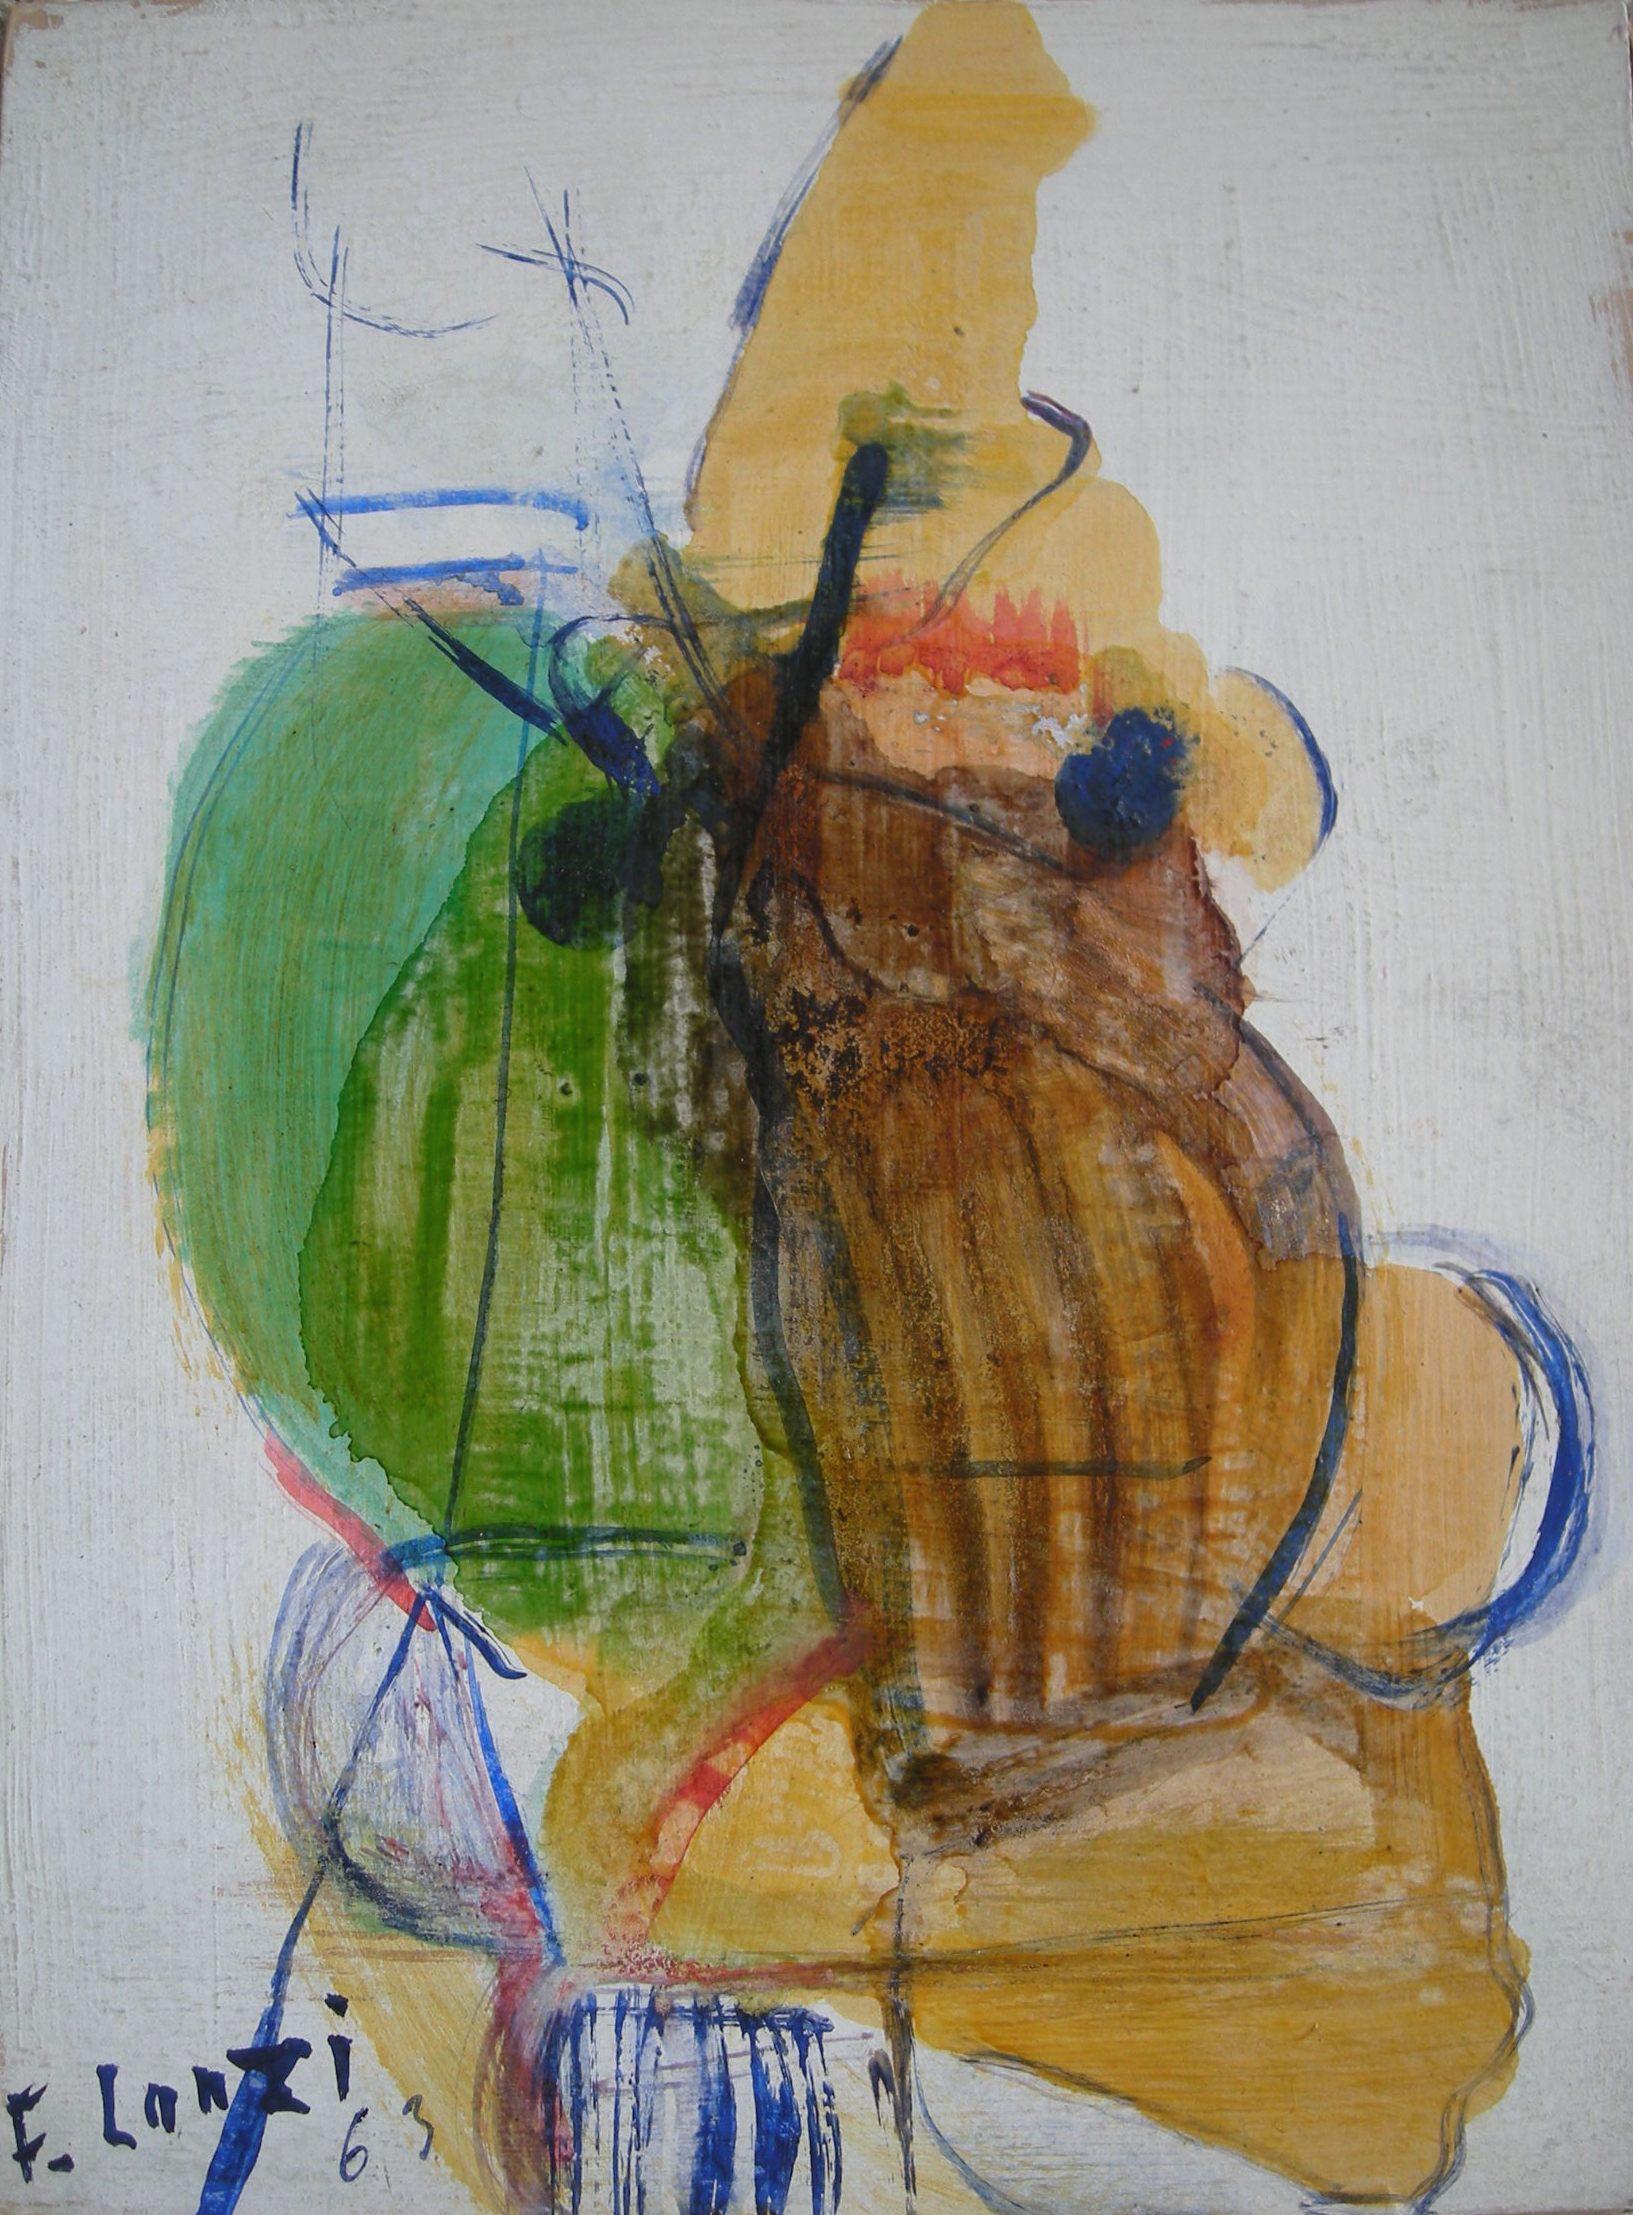 Francois Lanzi - Abstract 1963